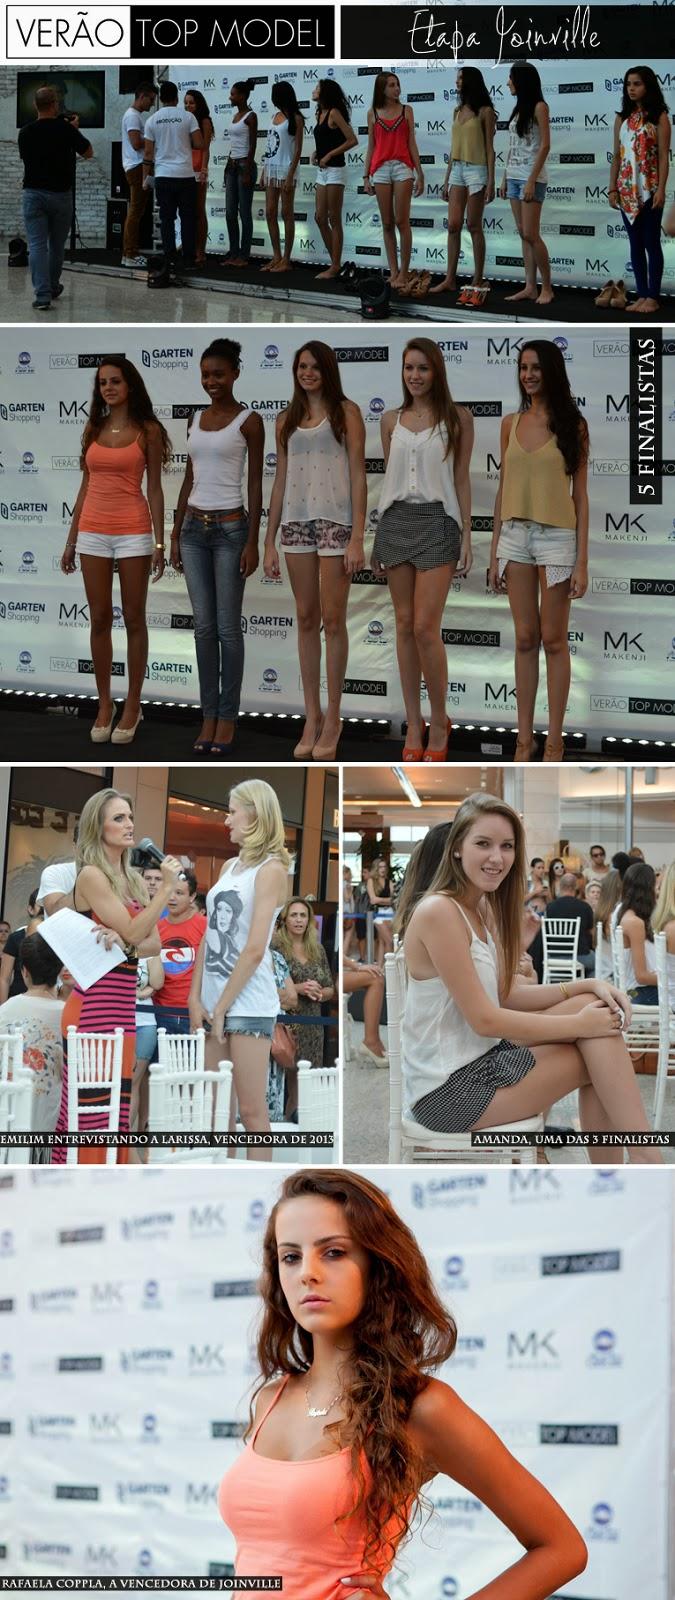 Verão Top Model, Joinville, VTM 2014, moda, vejo moda em tudo, modelos, moda, fashion,